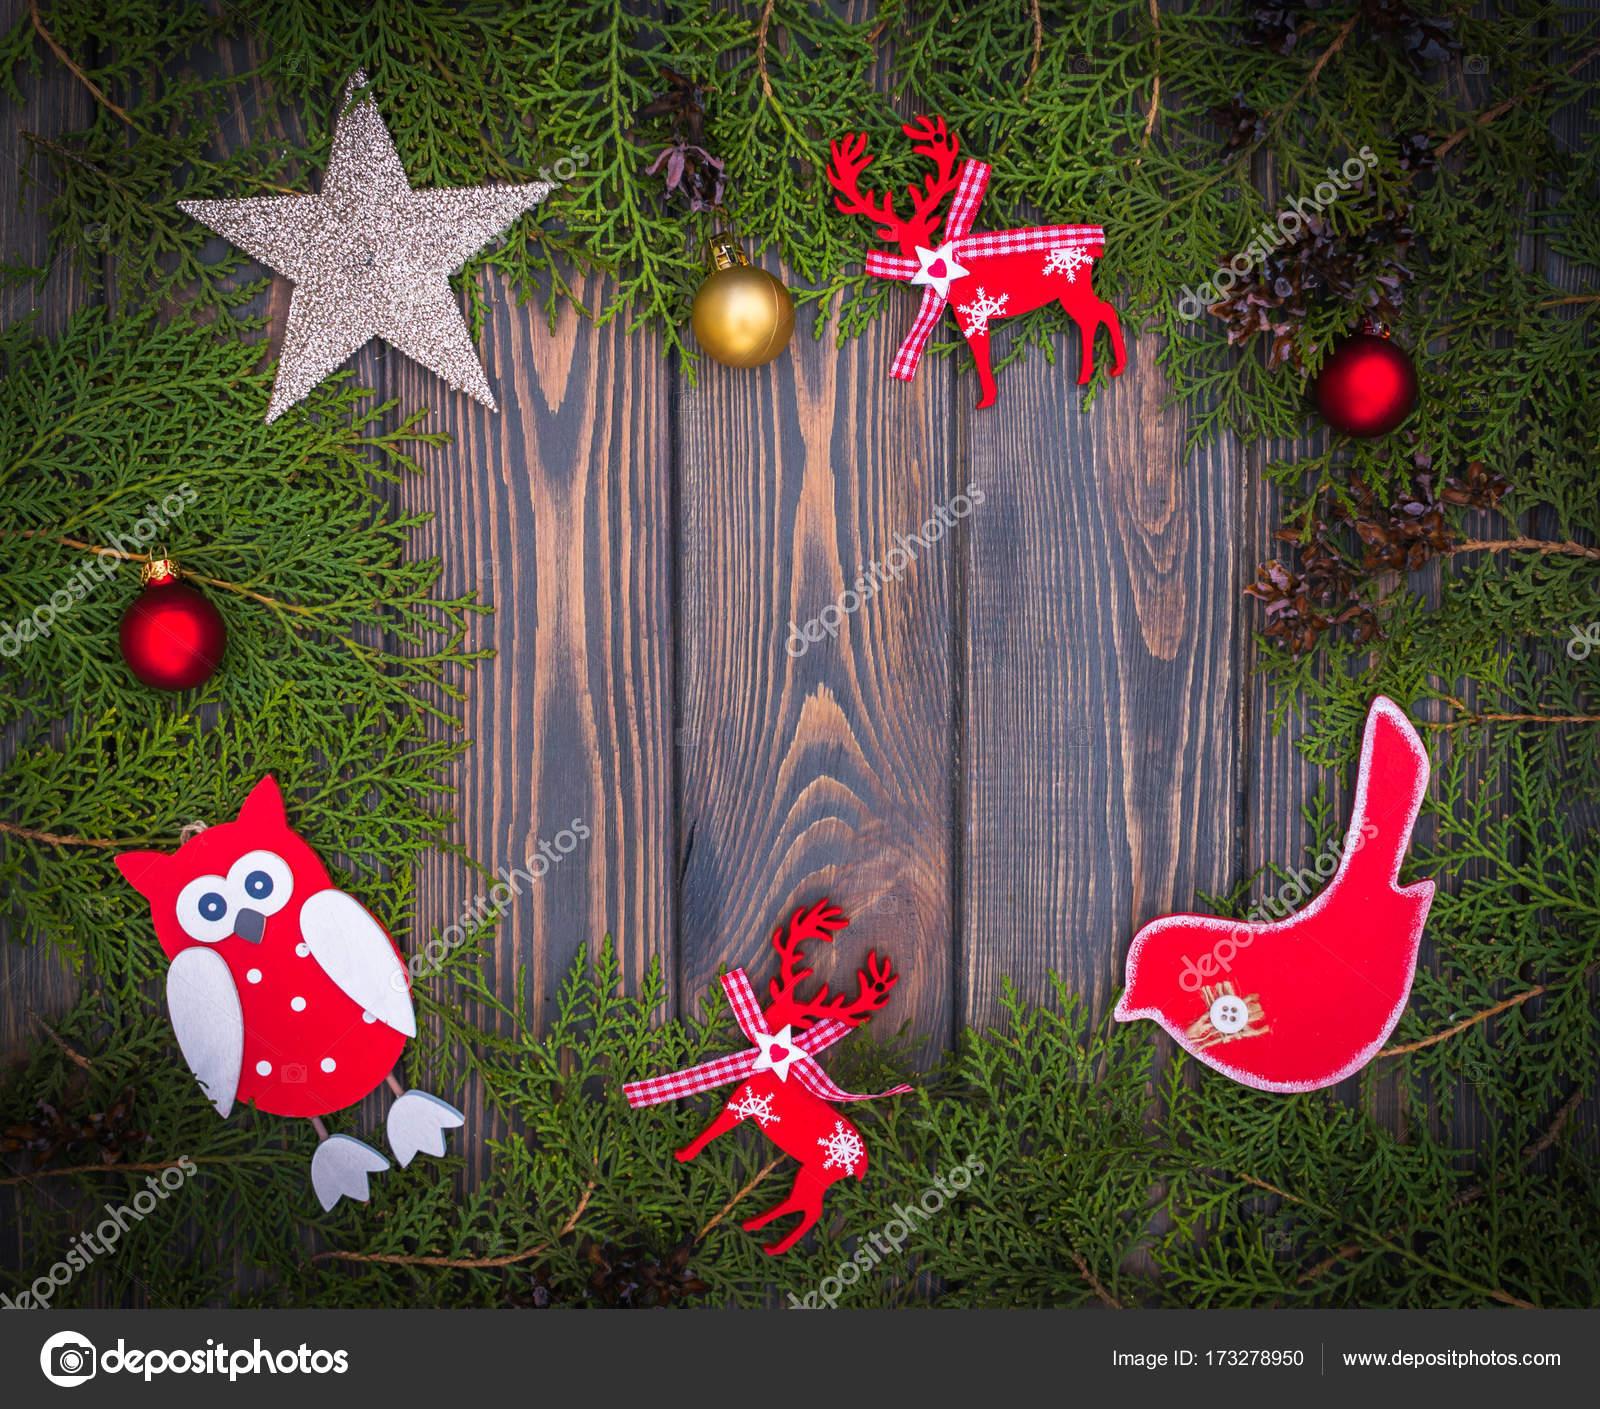 Christmas Tree Toys Handmade.Christmas Tree Toys Handmade And Green Spruce Branches